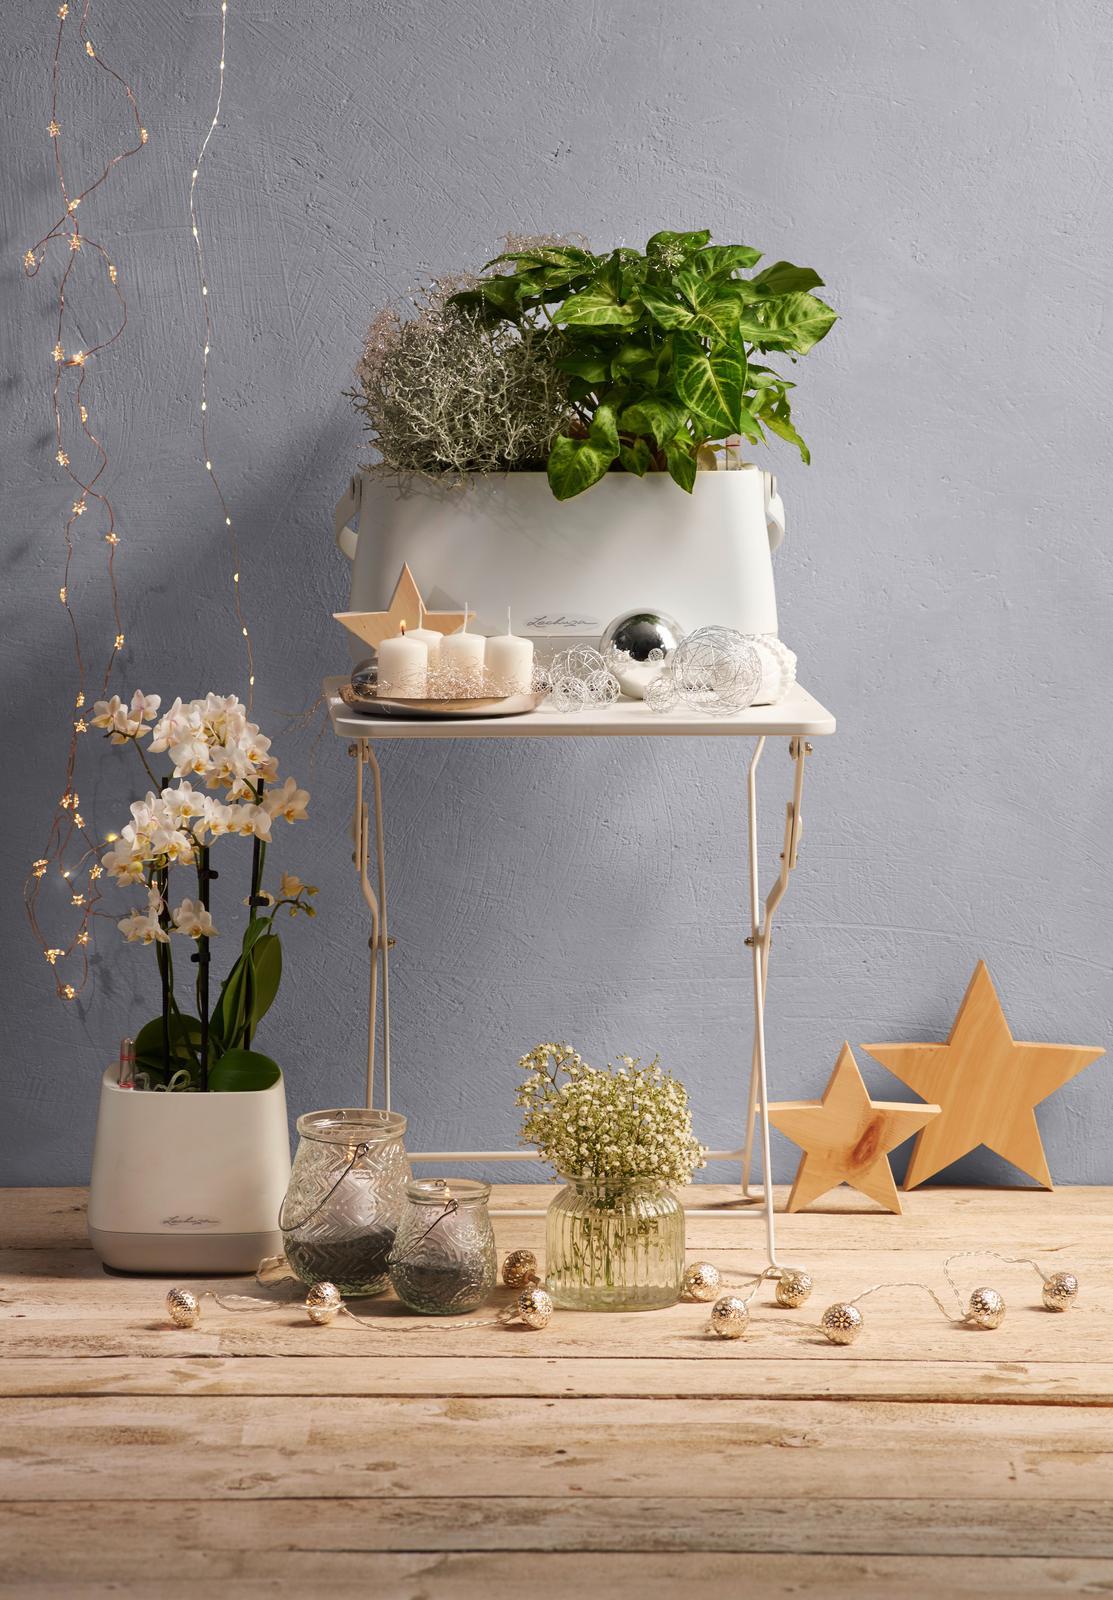 Pripravujeme nový kvetináč Yula | LECHUZA - Novinka! Samozavlažovacie kvetináče Yula | LECHUZA